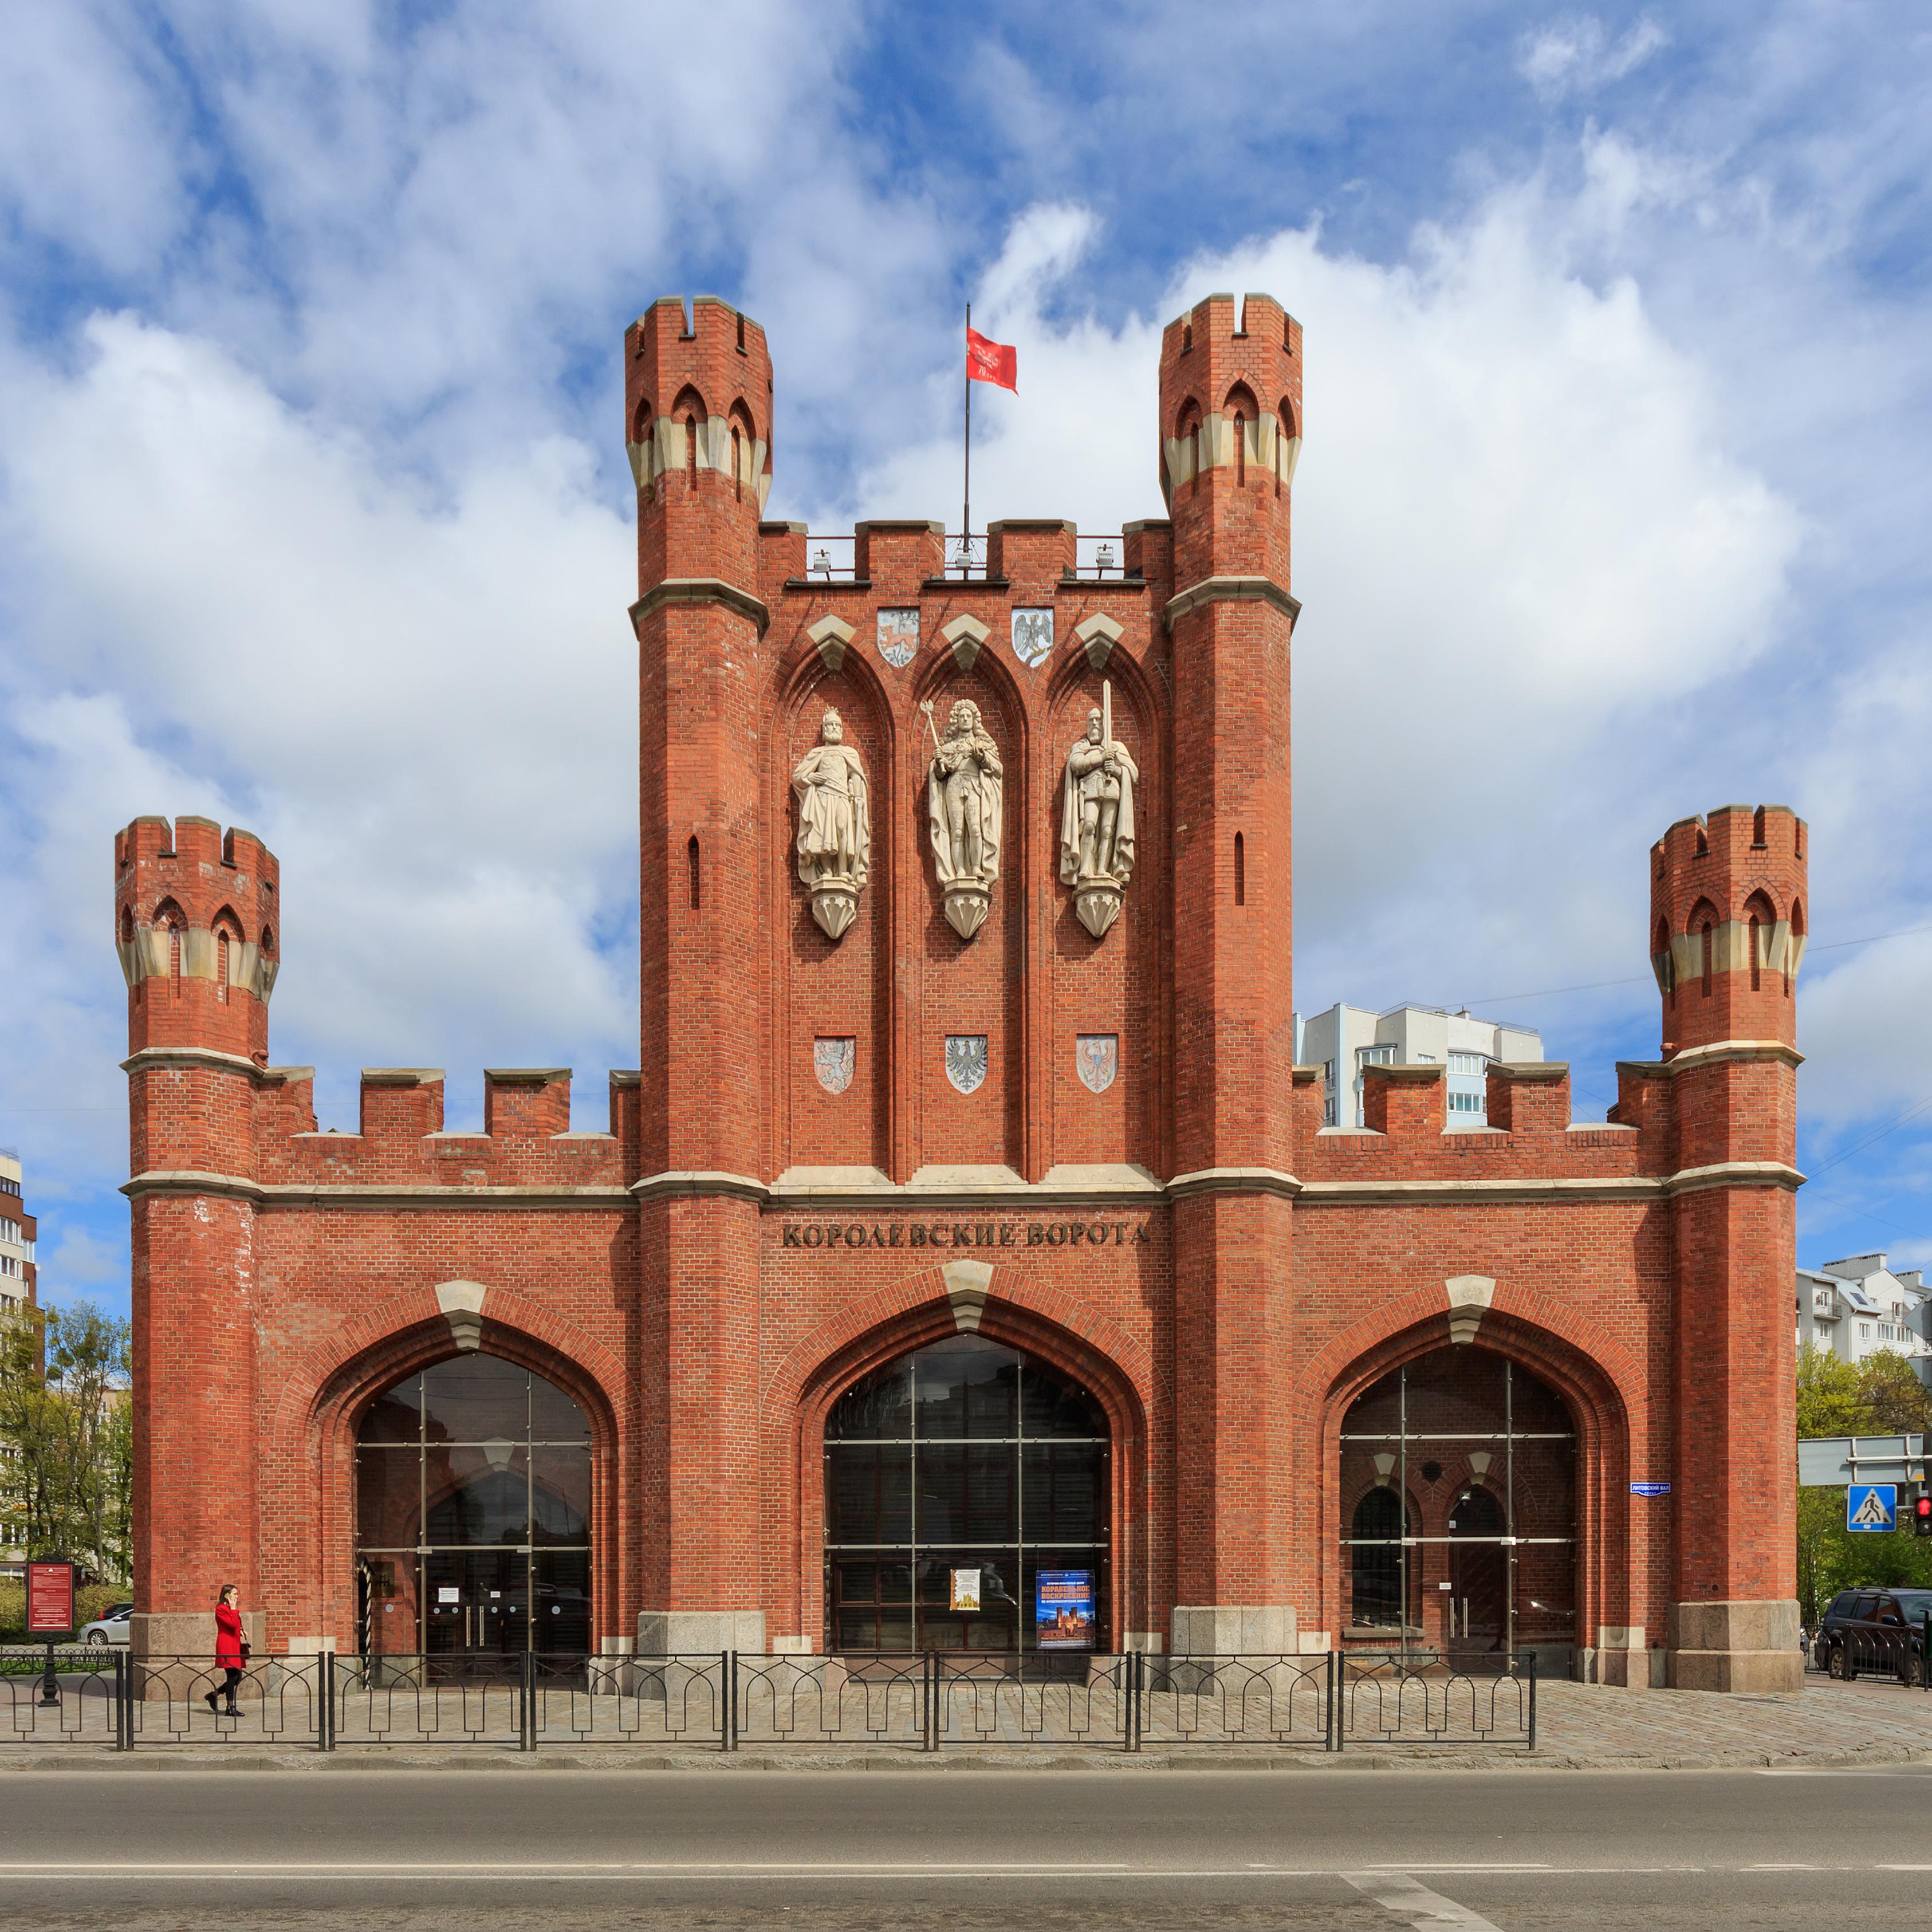 Russian Towns, Cities / Urban Development - Page 6 Kaliningrad_05-2017_img18_Kings_Gate